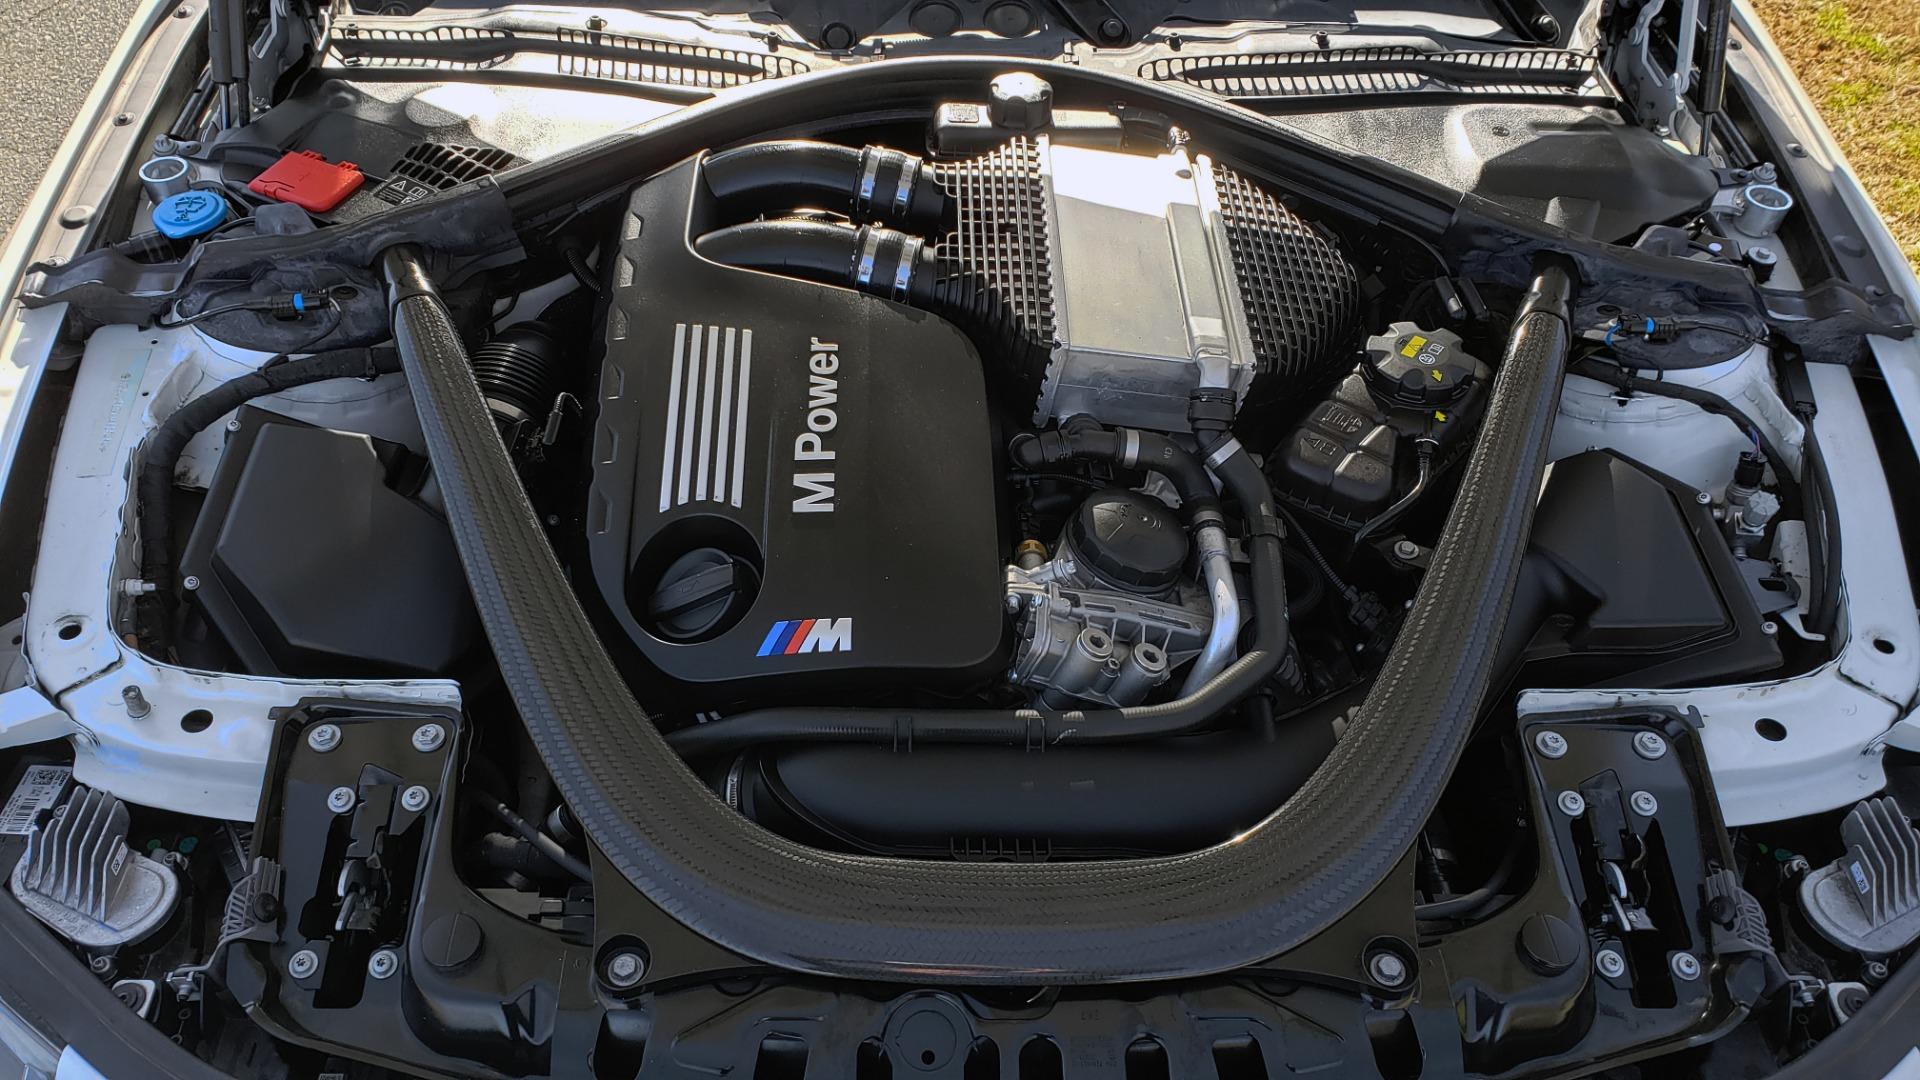 Used 2018 BMW M4 COMP PKG / EXEC / M-DRIVER / PARK CNTRL / ACTIVE BLIND SPOT for sale $45,449 at Formula Imports in Charlotte NC 28227 19